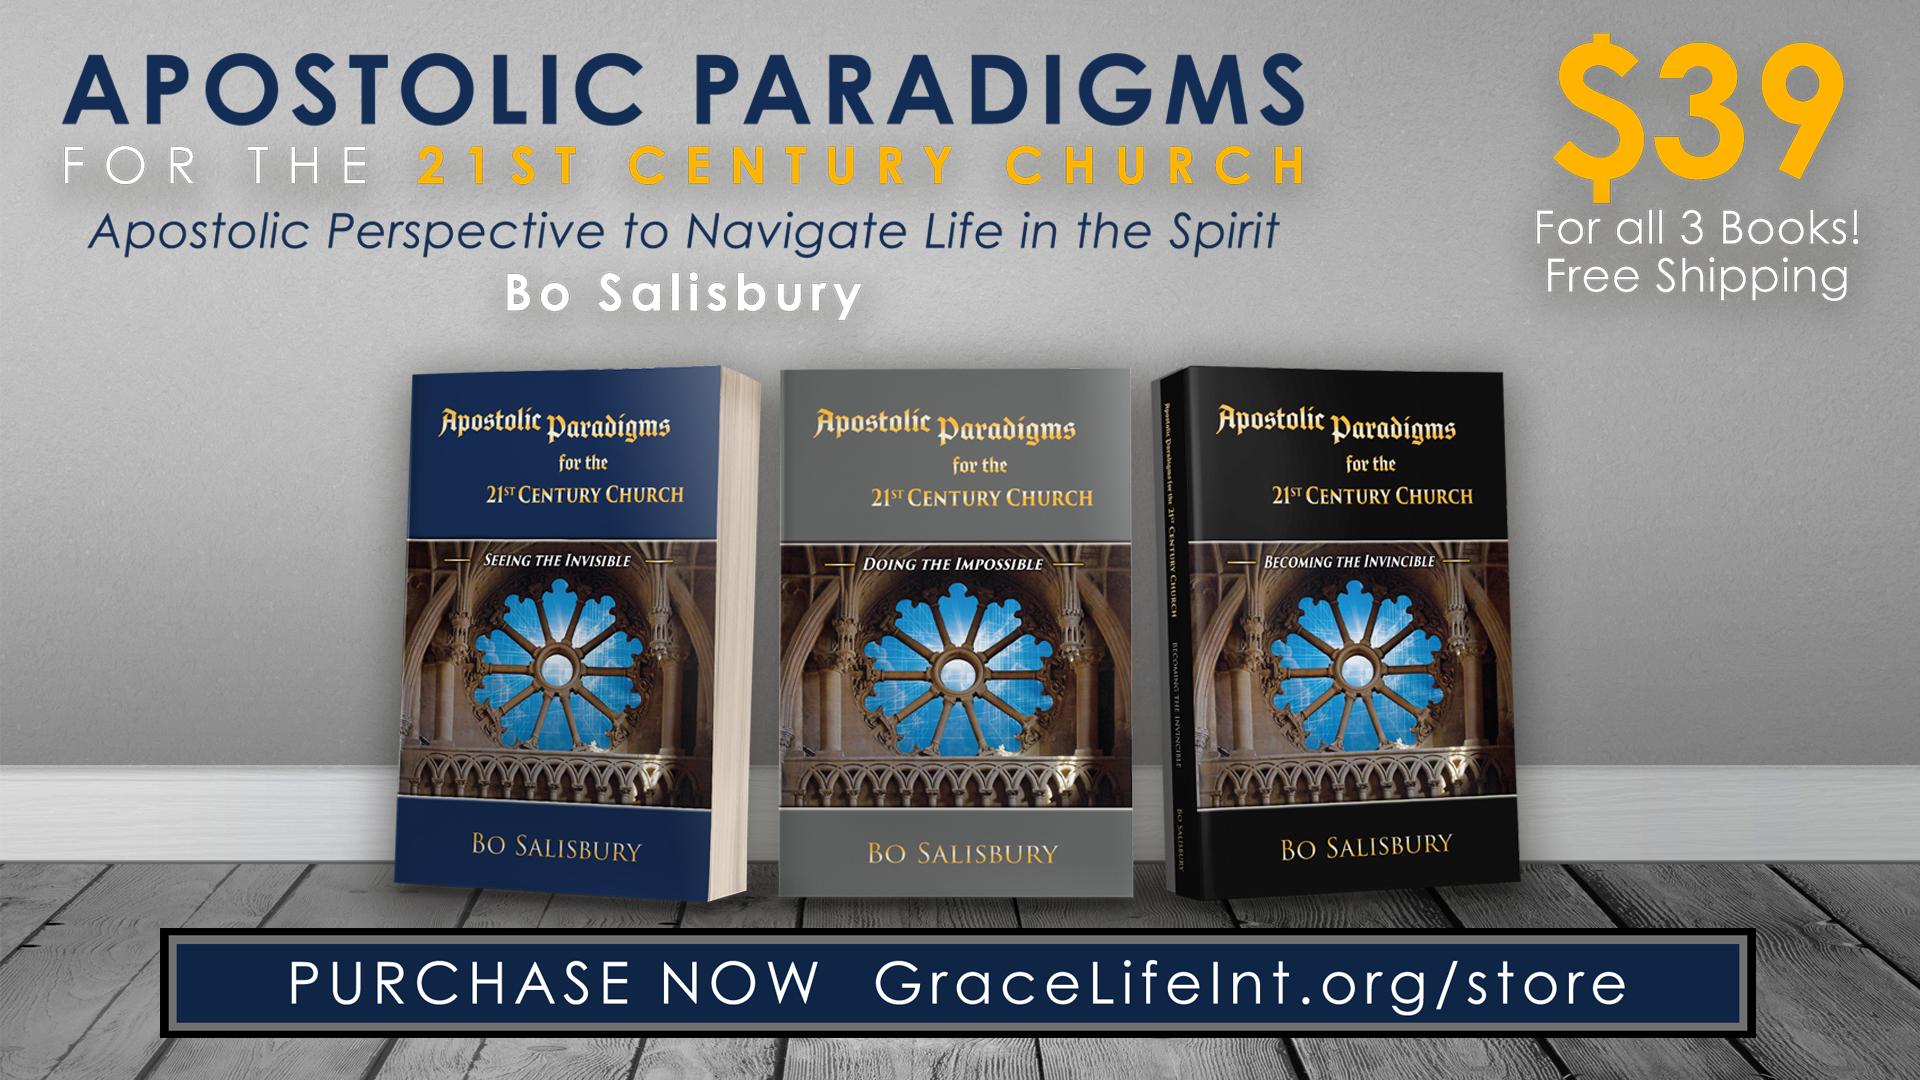 Apostolic Paradigms Series (ePub/PDF download all 3 books) 00004